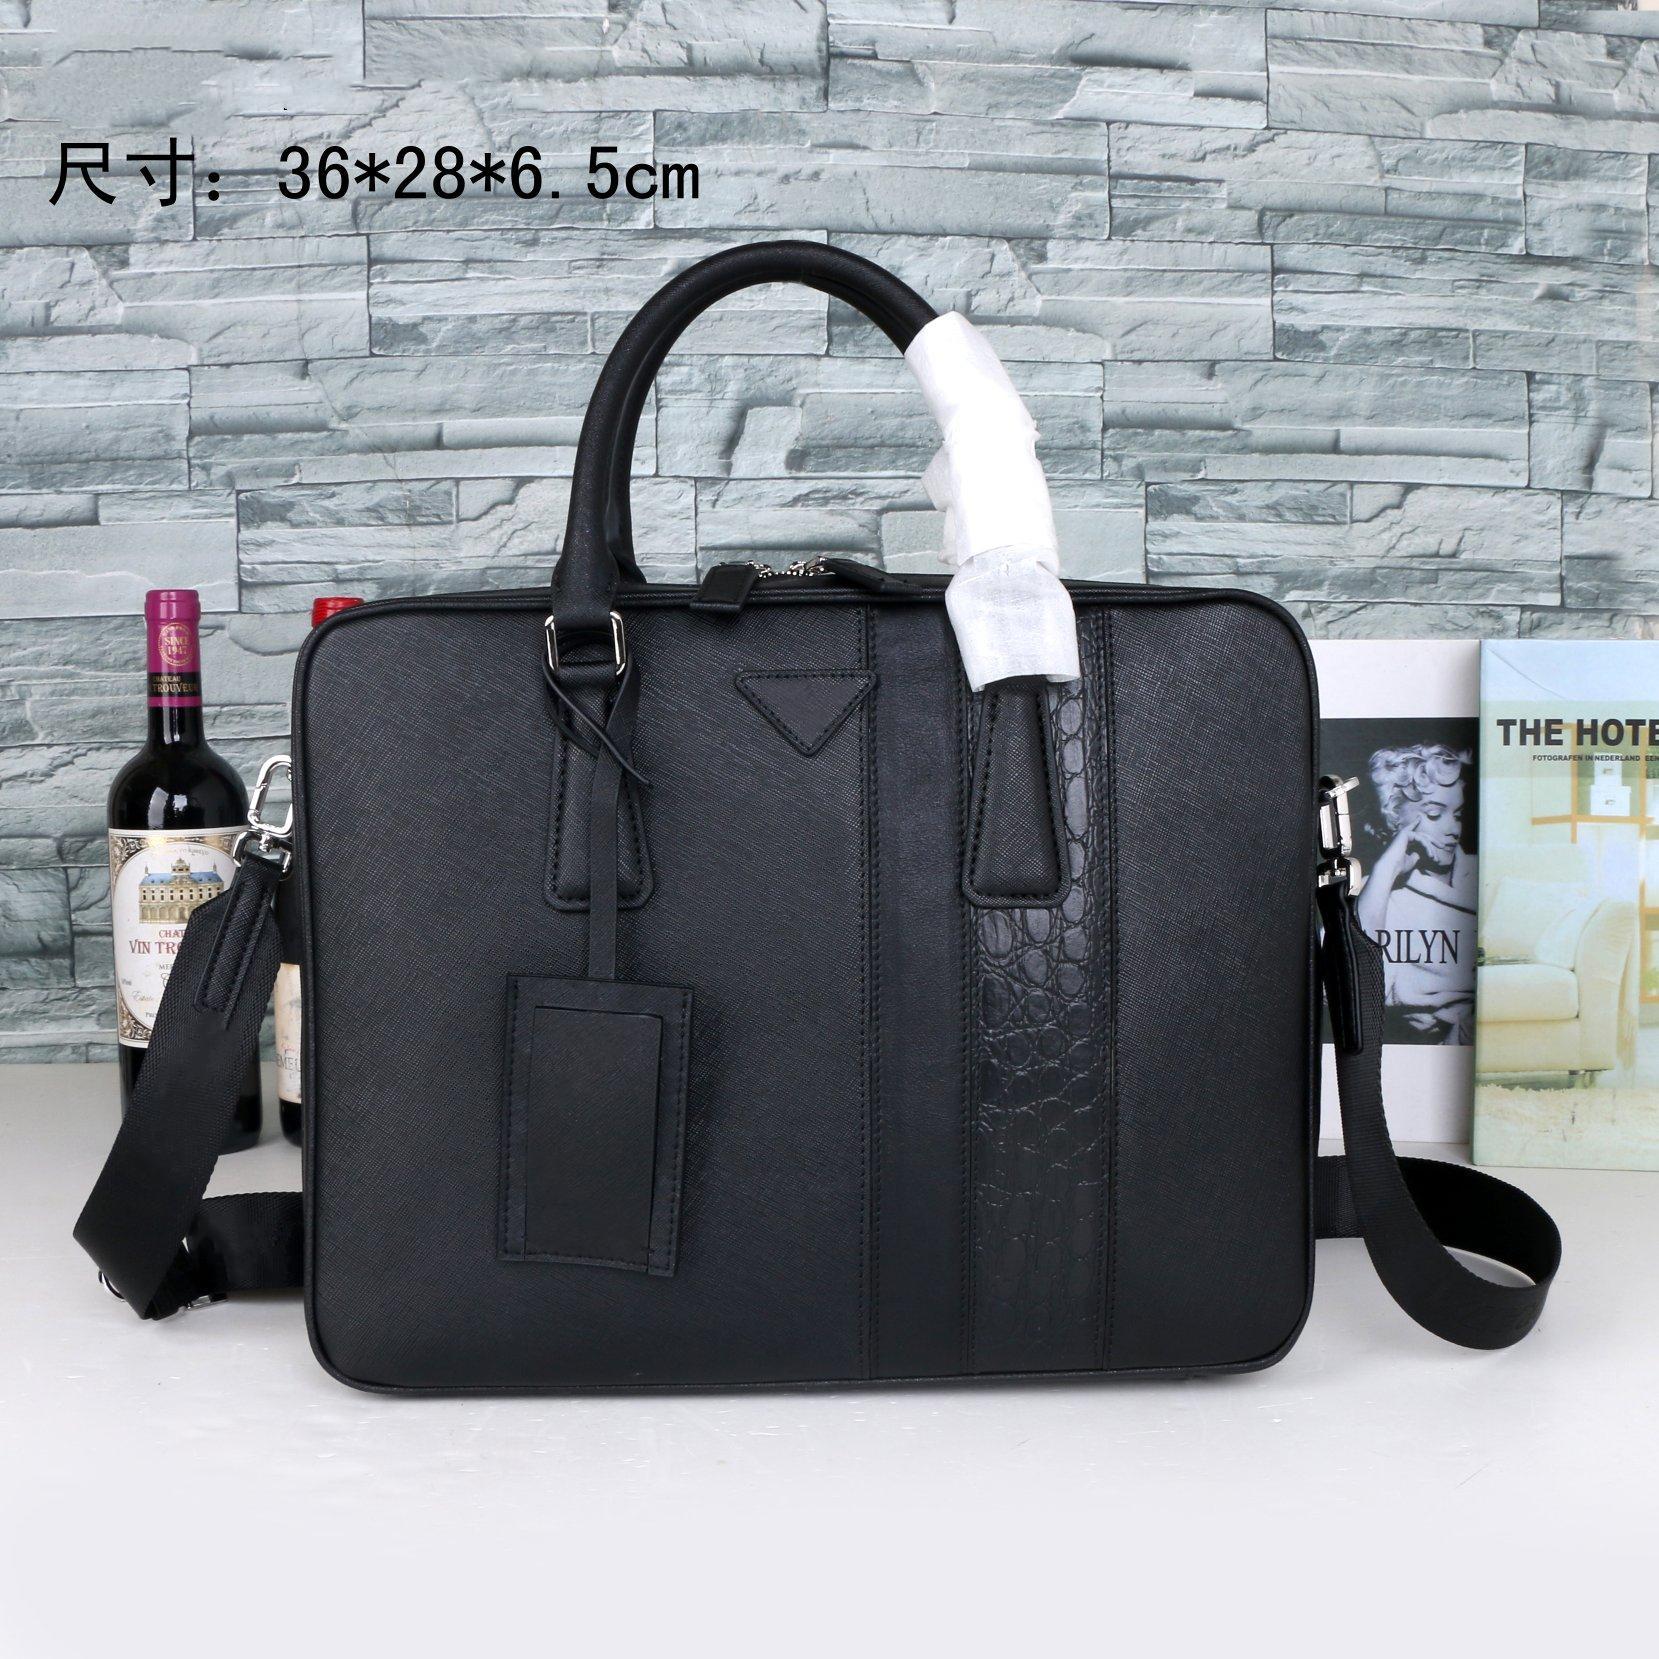 2021 men's black leather designer briefcase laptop bag large capacity retro fashion office handbag